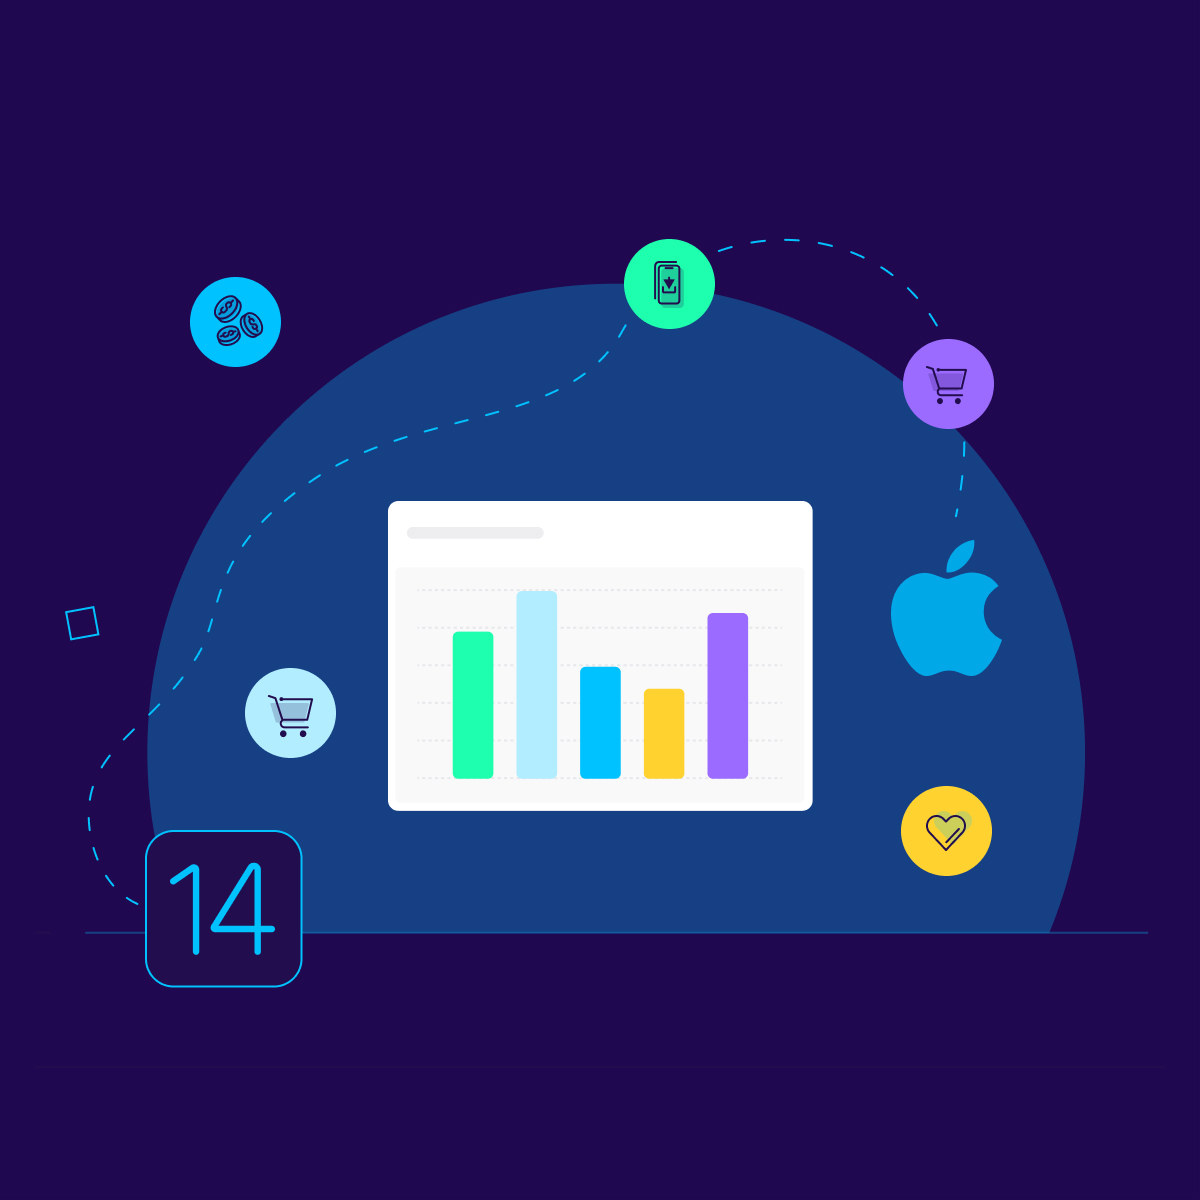 skadnetwork data insights - Square